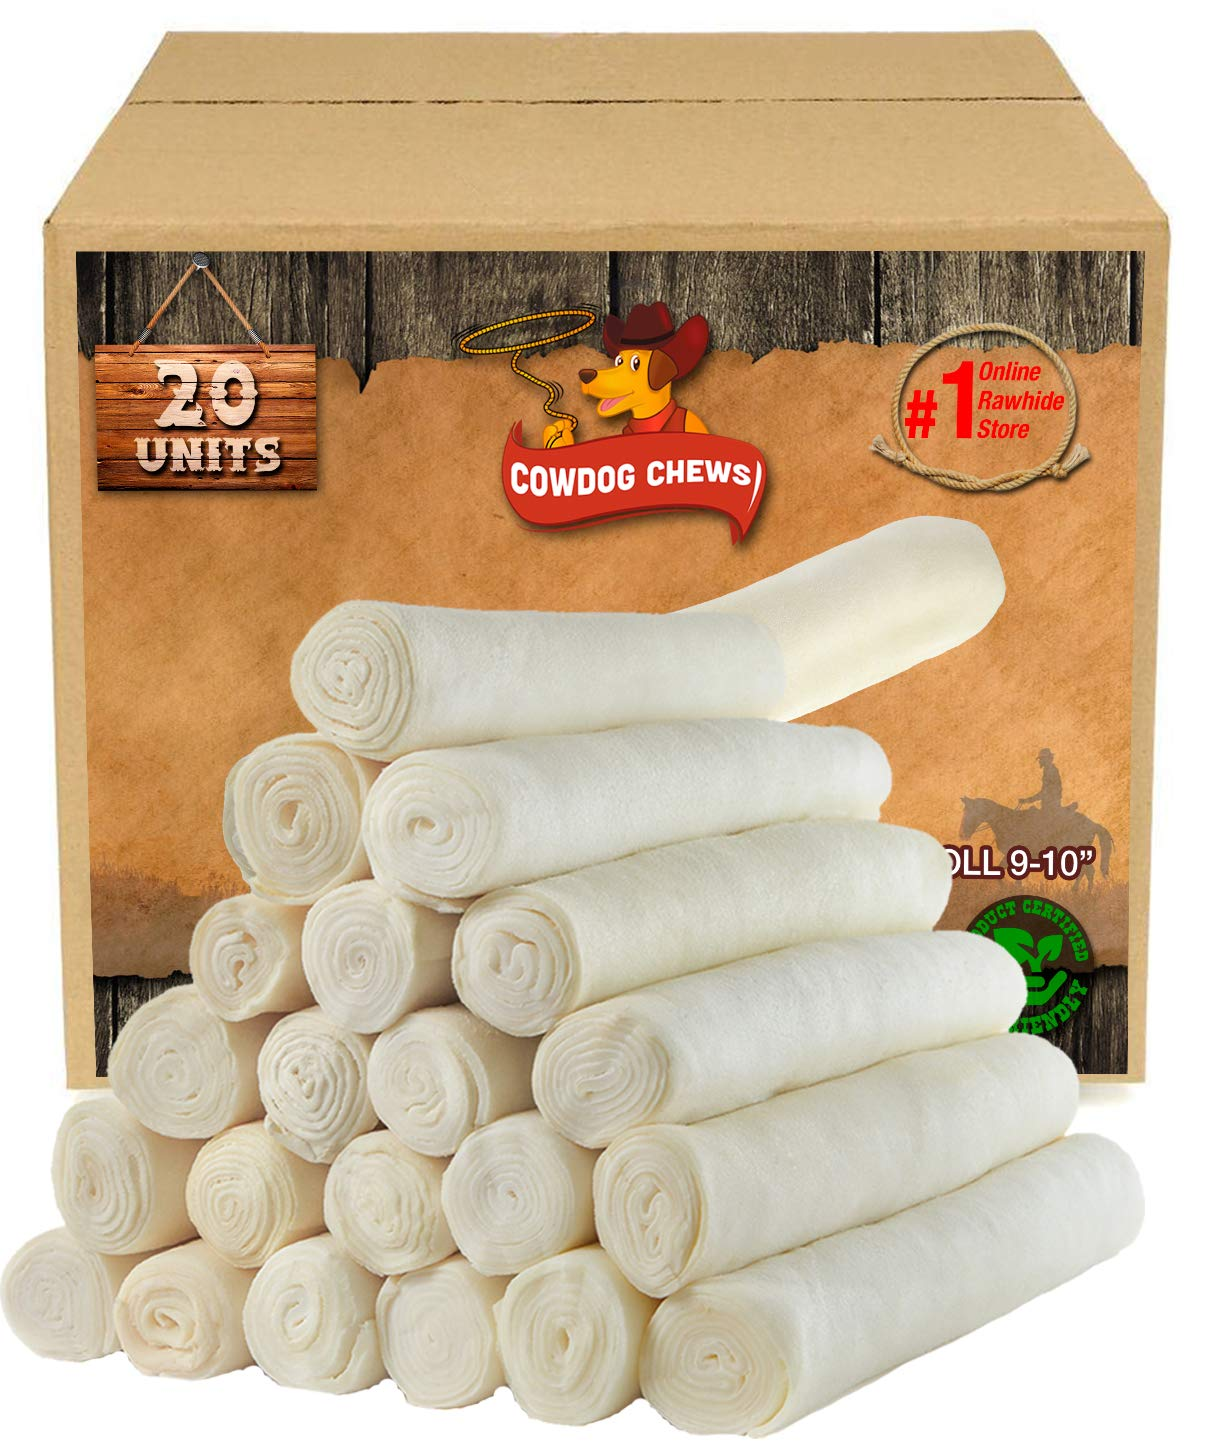 Retriever roll 9-10″ (20 Pack) Extra Thick Cow Dog Chews️